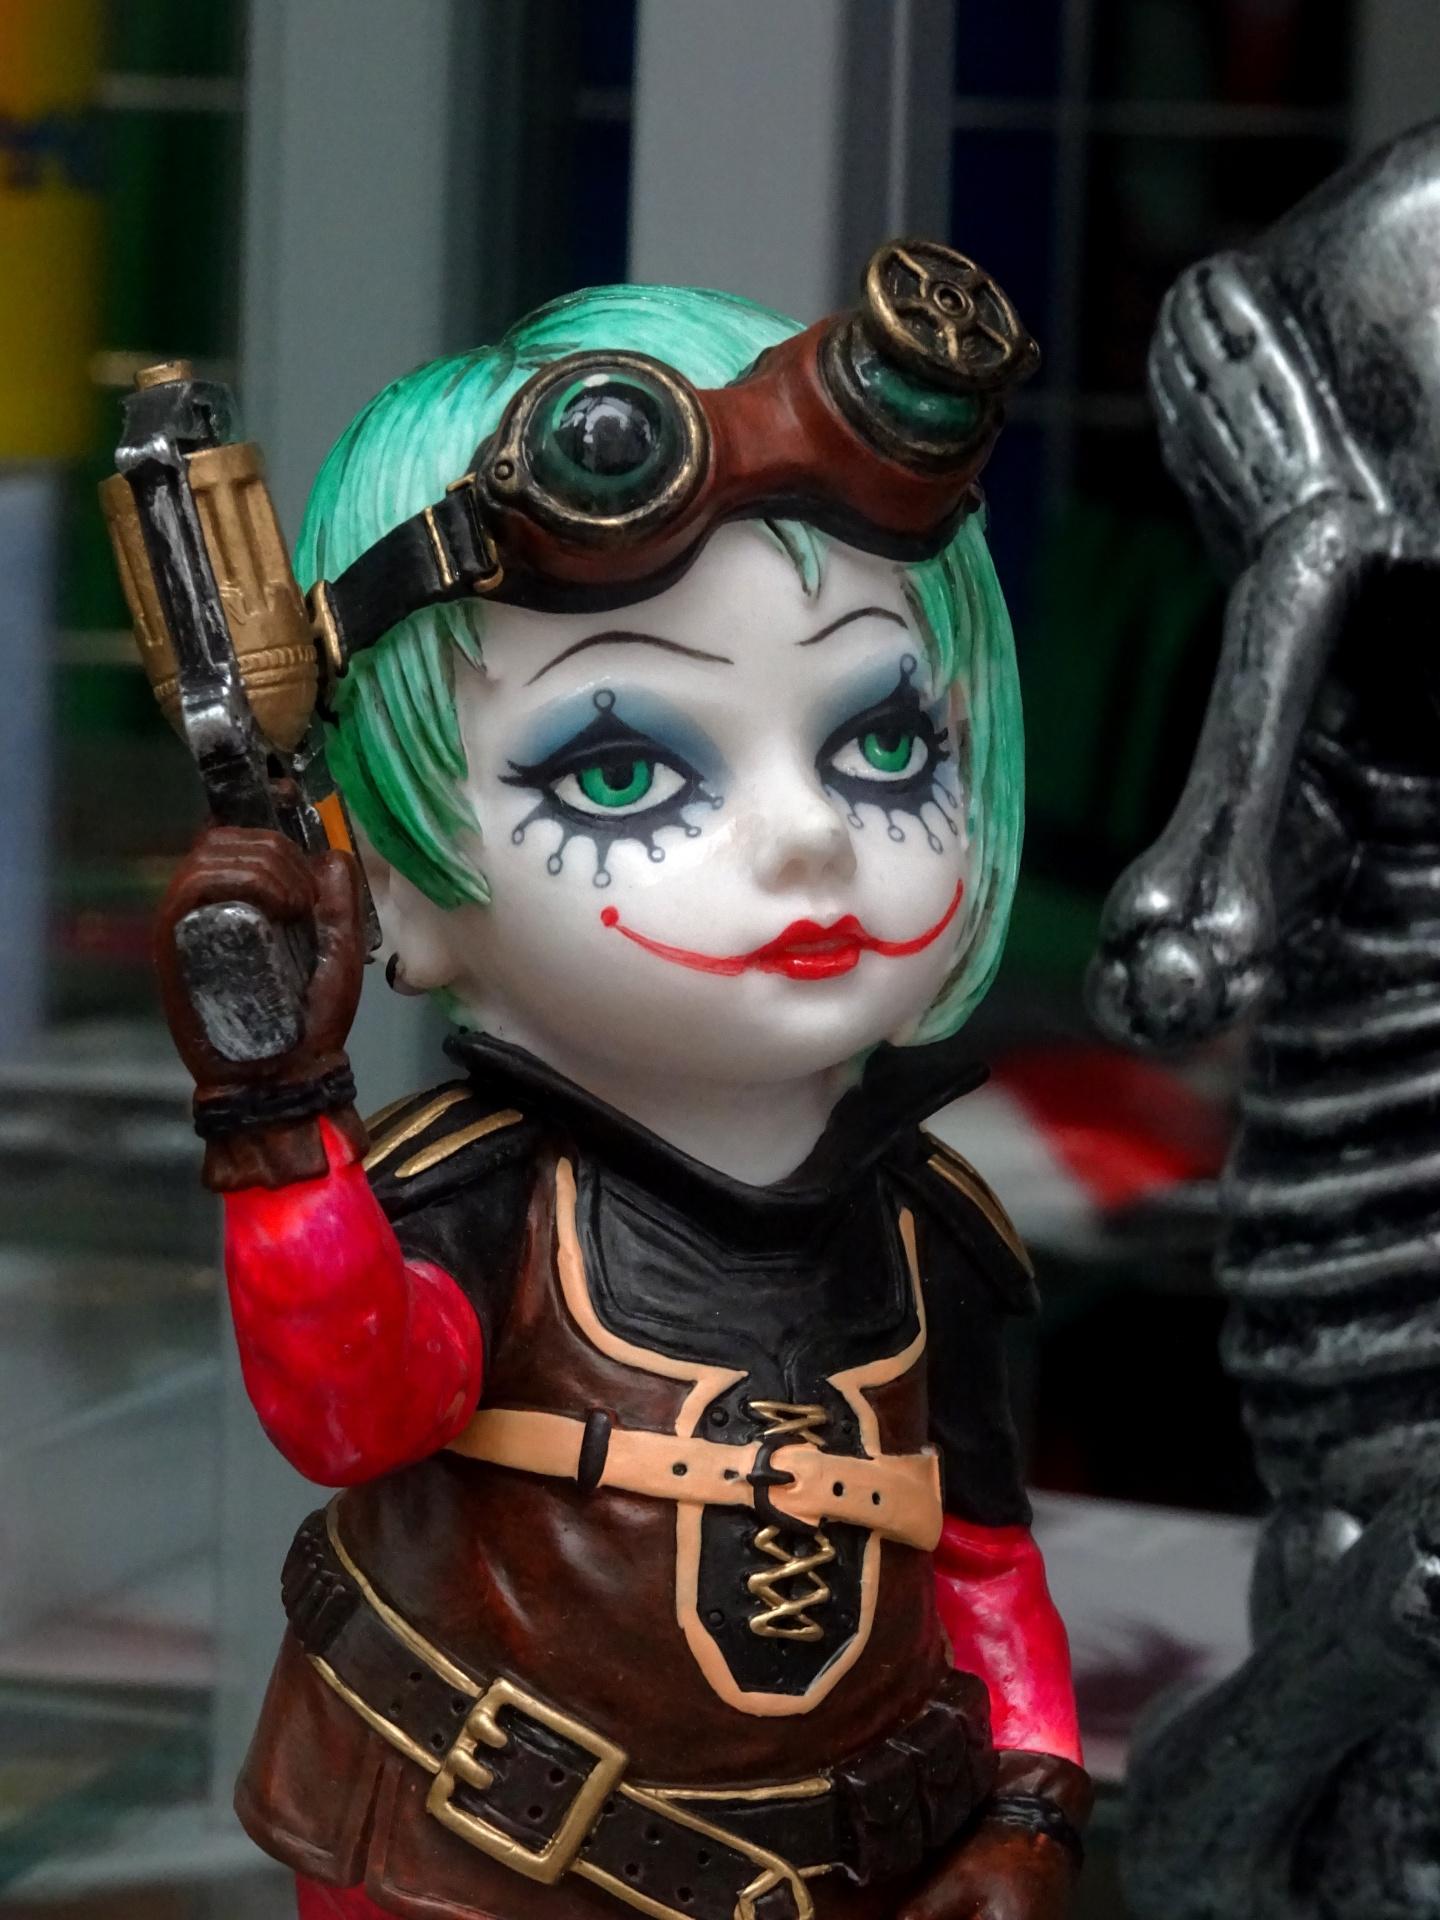 goth,gothic,anime,doll,dolls - free photo from needpix